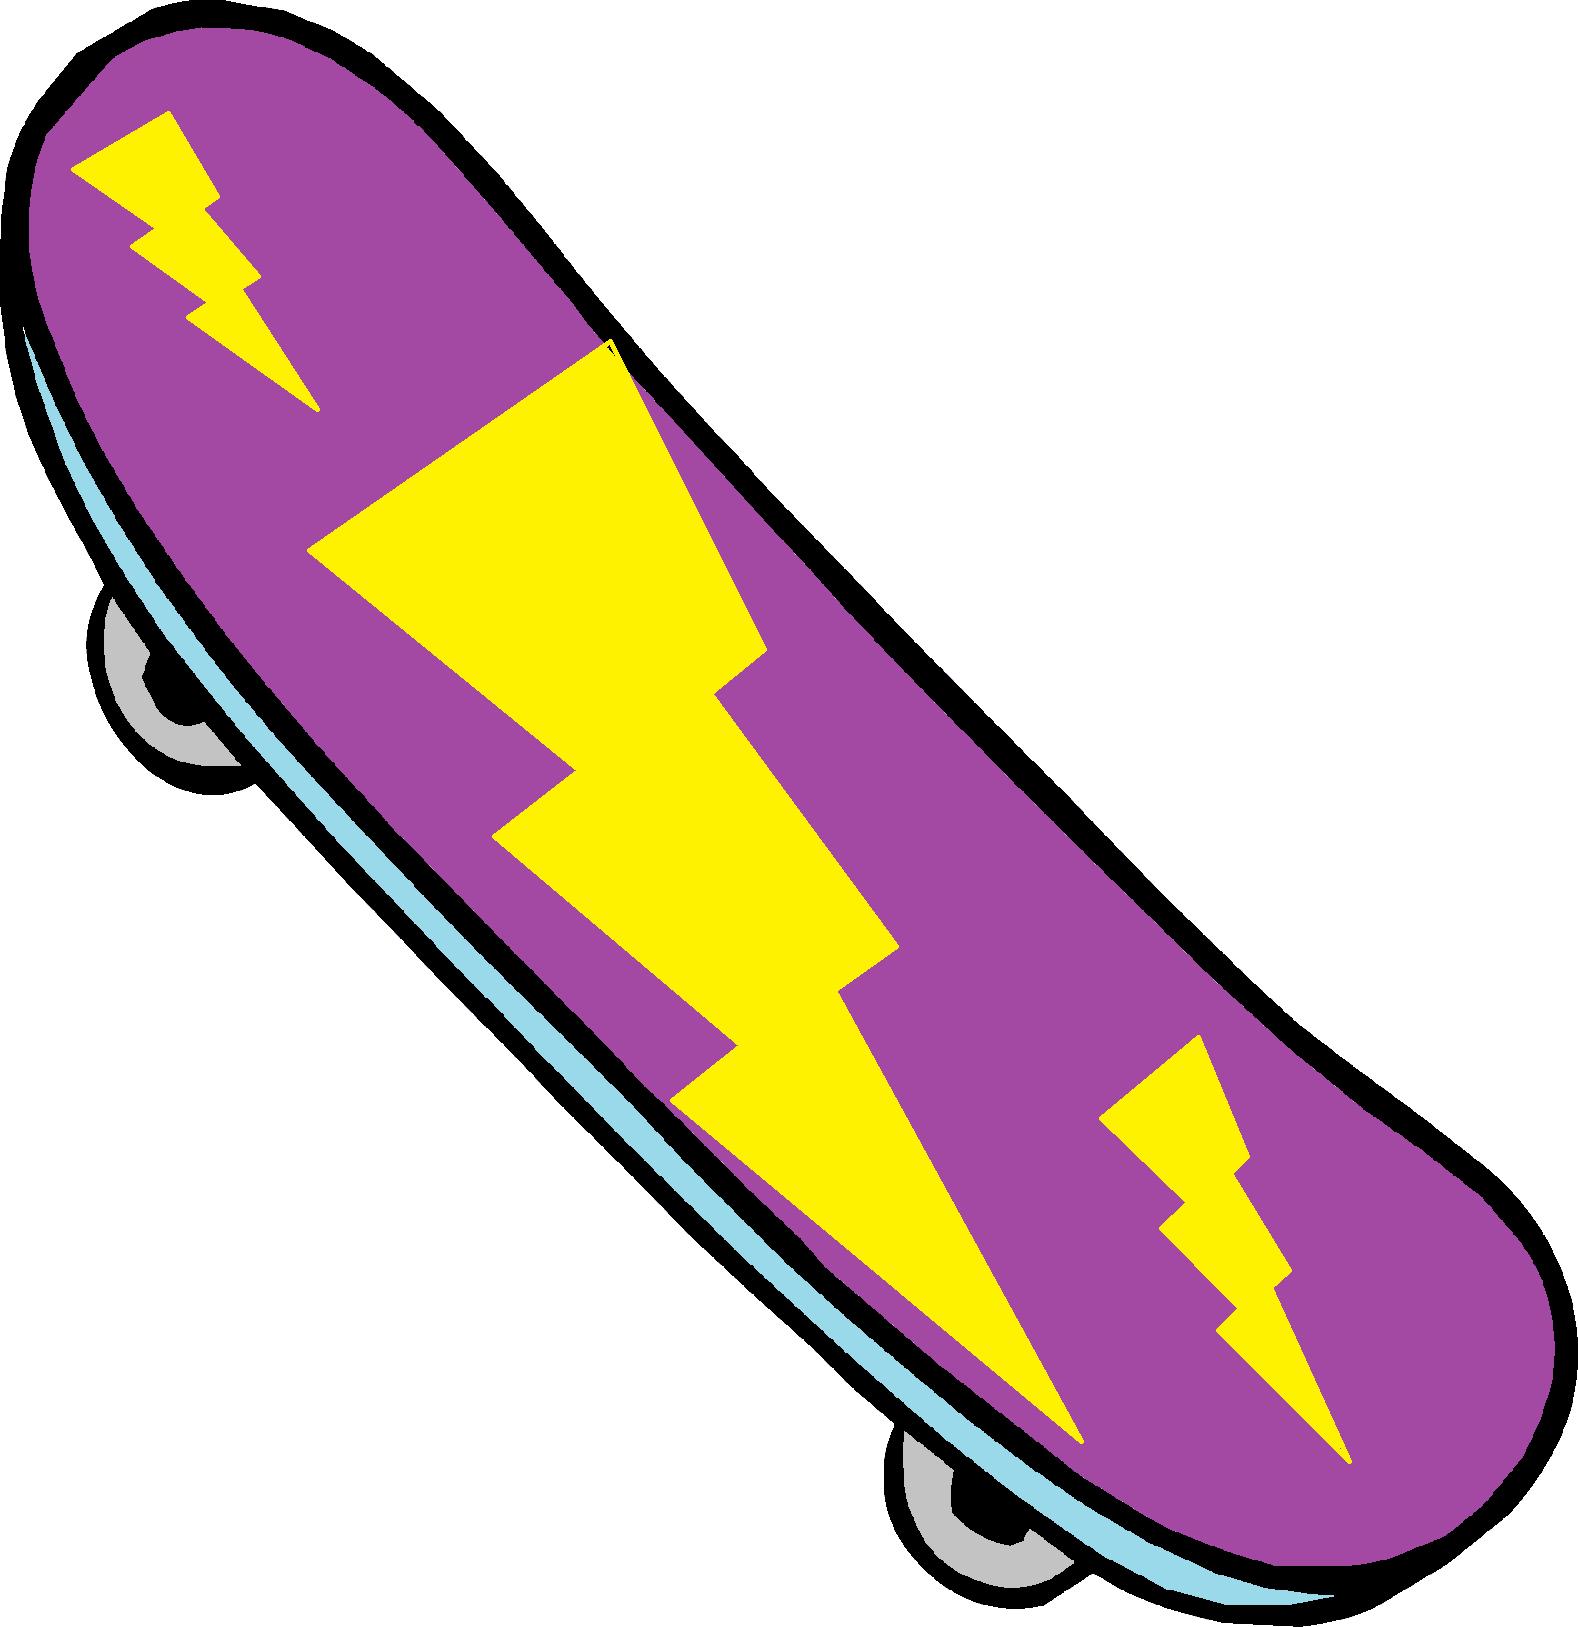 Skateboard Png Clipart Skateboard Clipart Png.